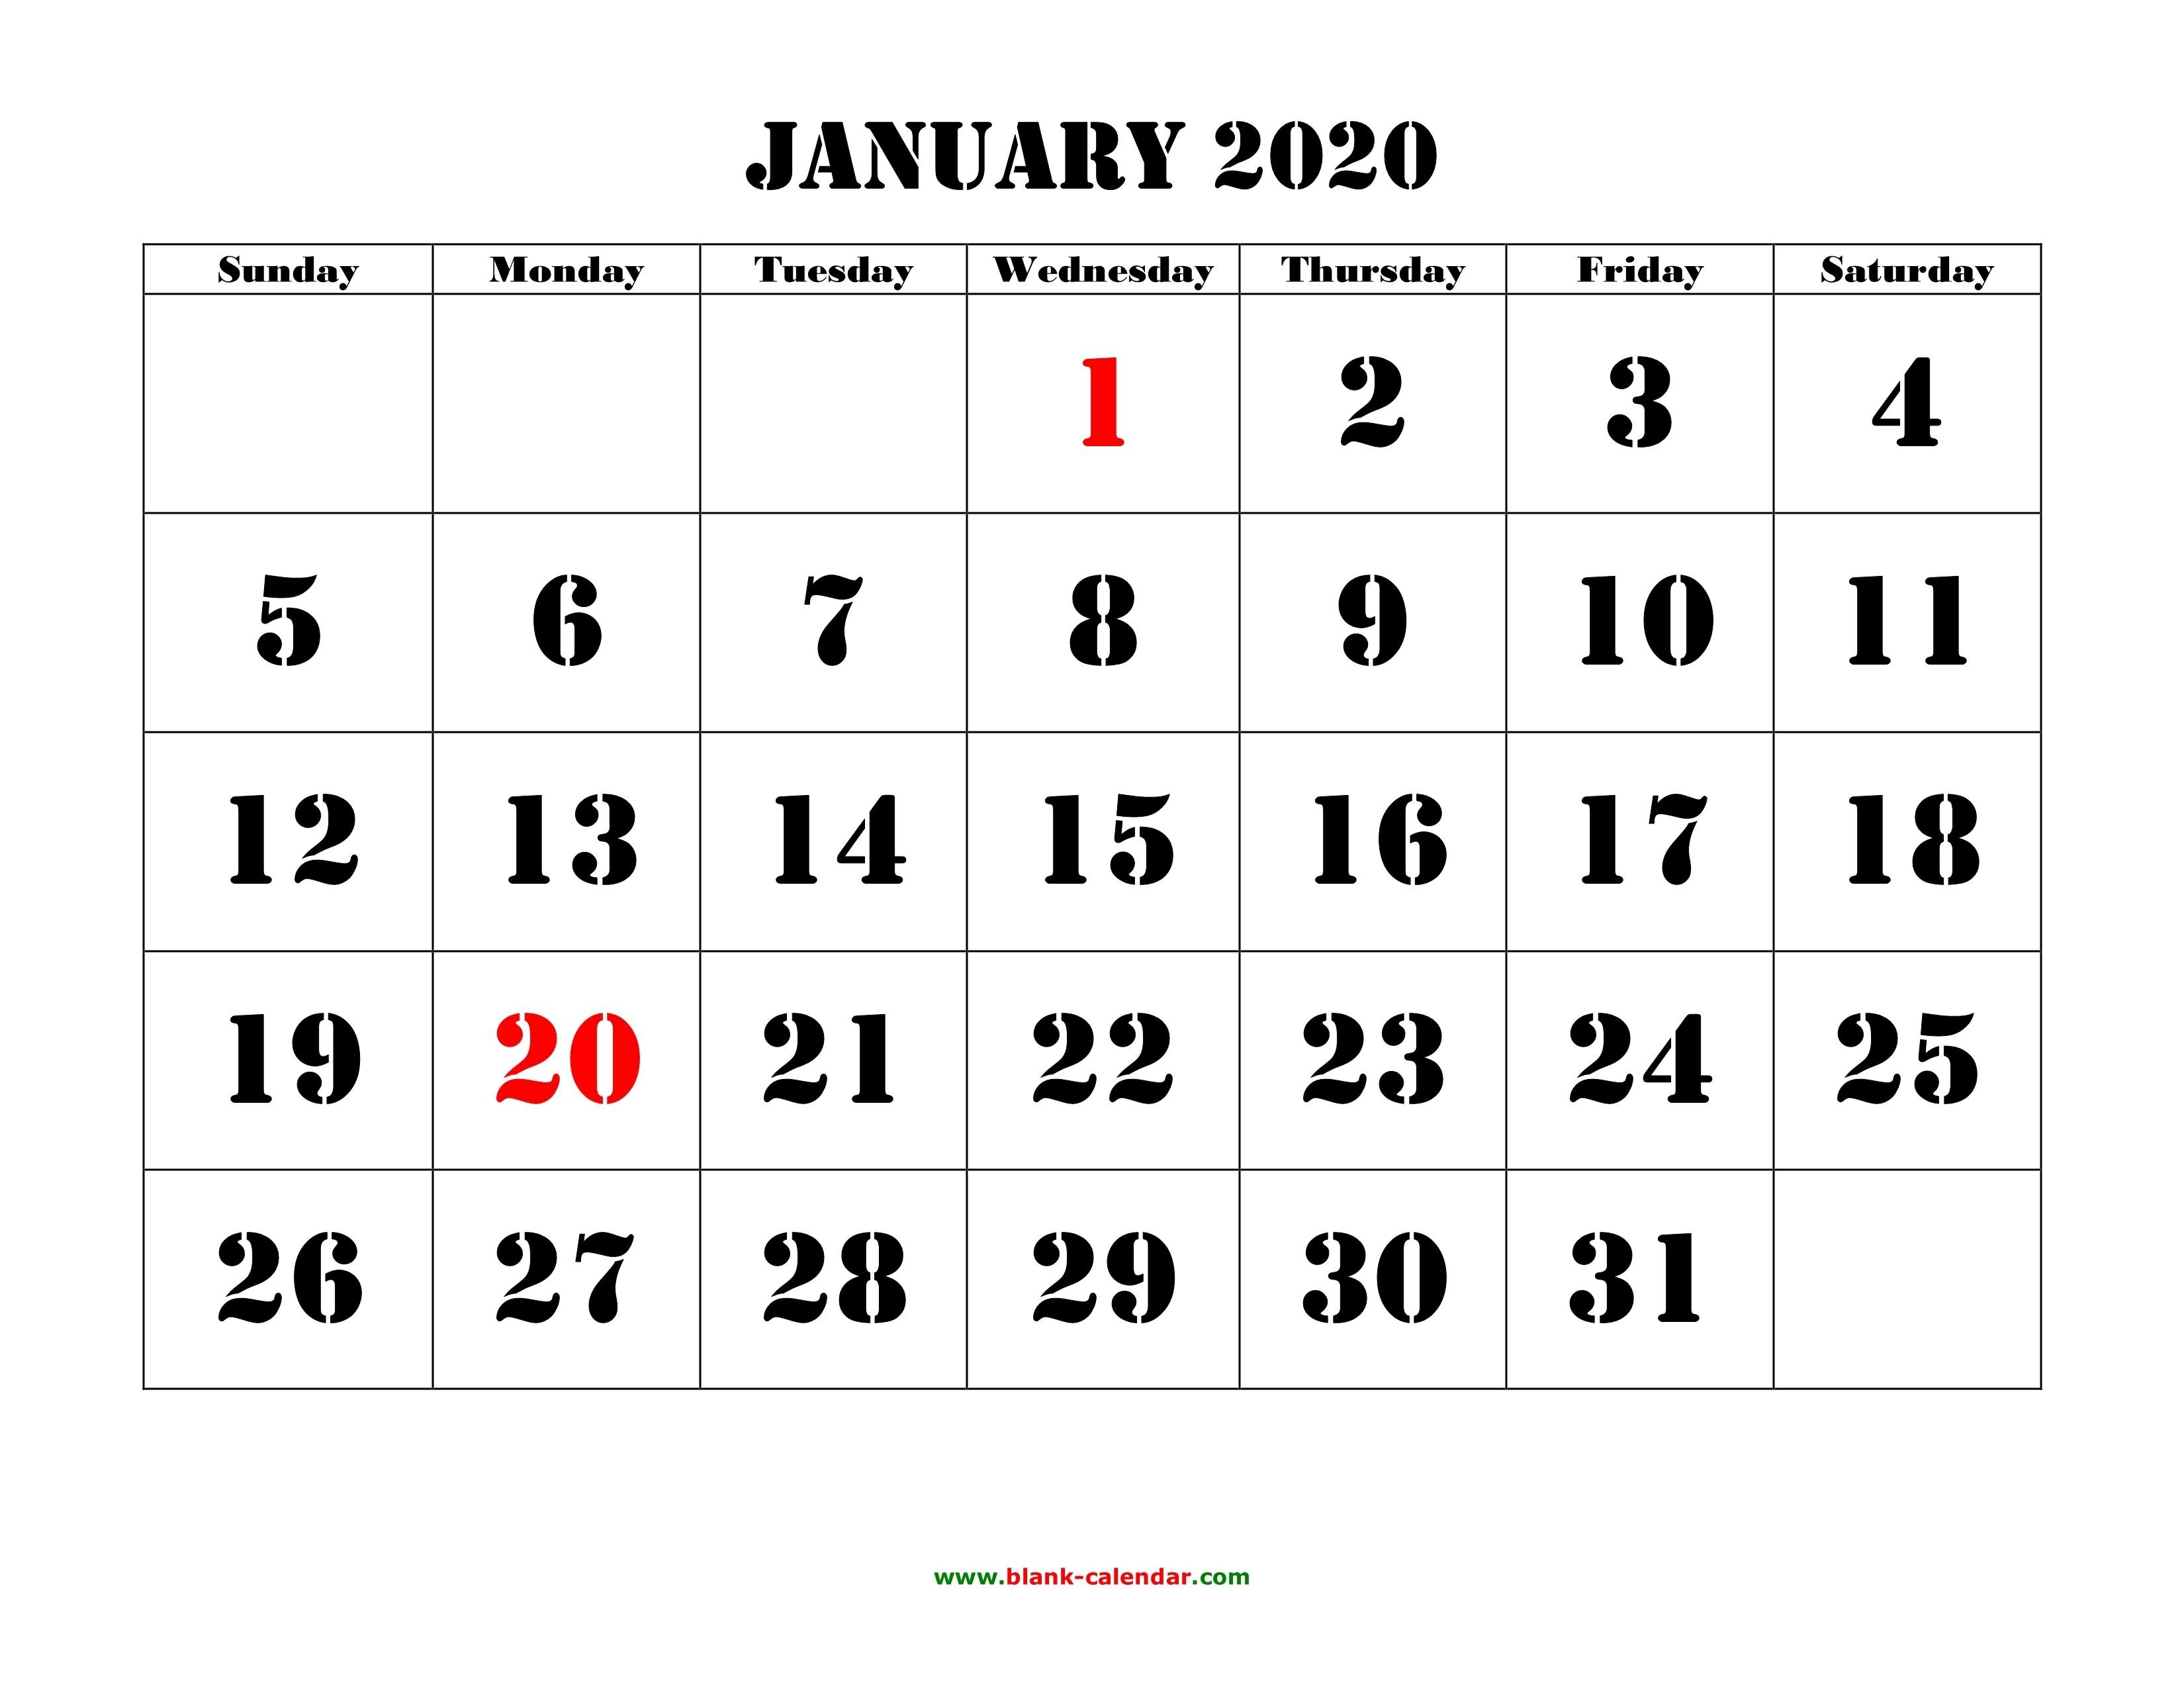 Free Download Printable Calendar 2020, Large Font Design-Printable Monthly Bill Pay Calendar 2020